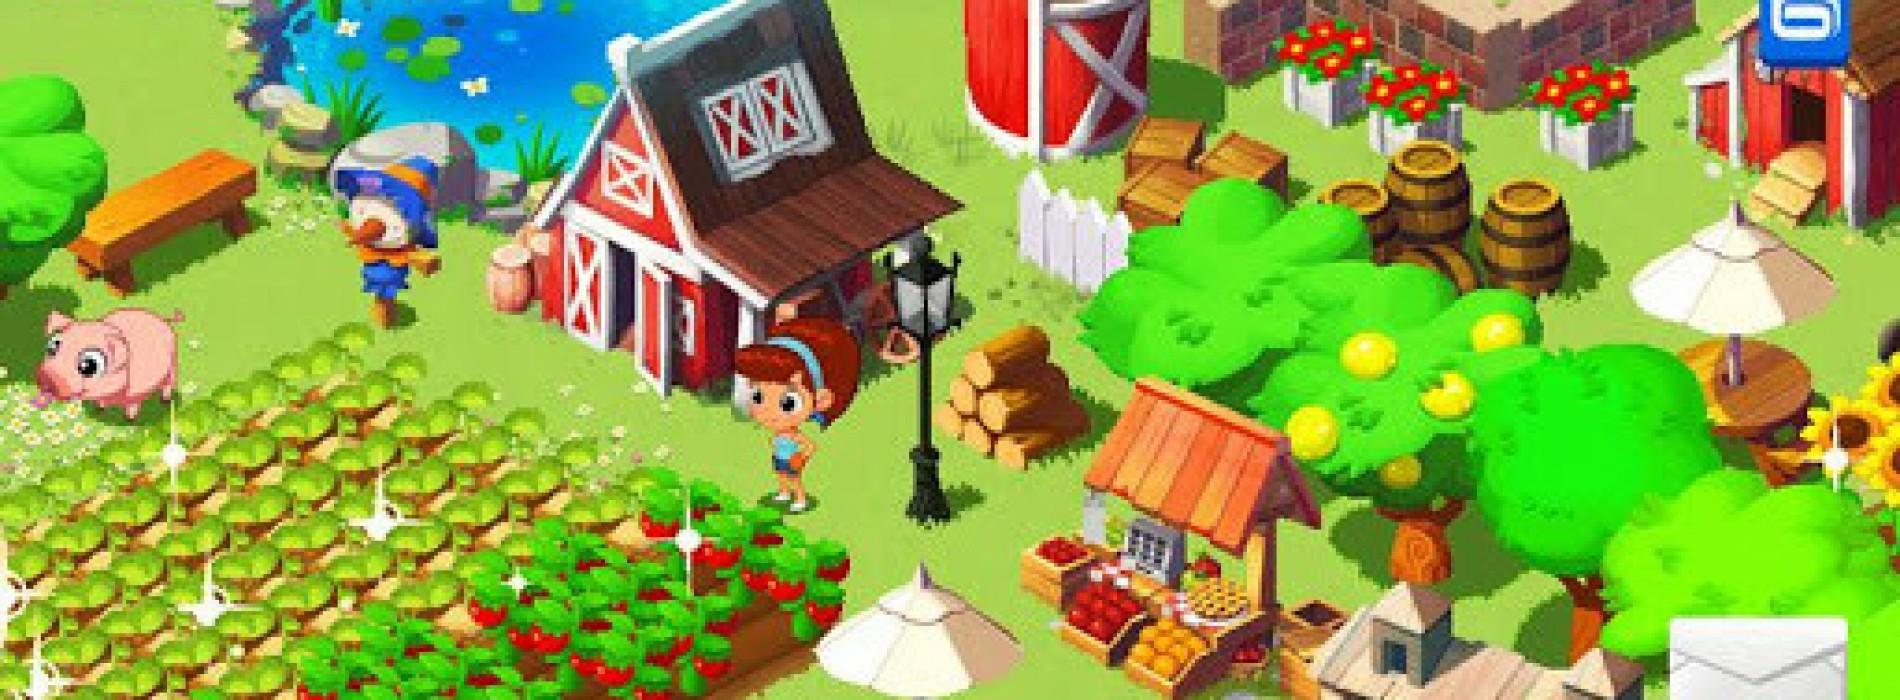 "Gameloft's Green Farm 3 intros new line of ""lighter"" games"